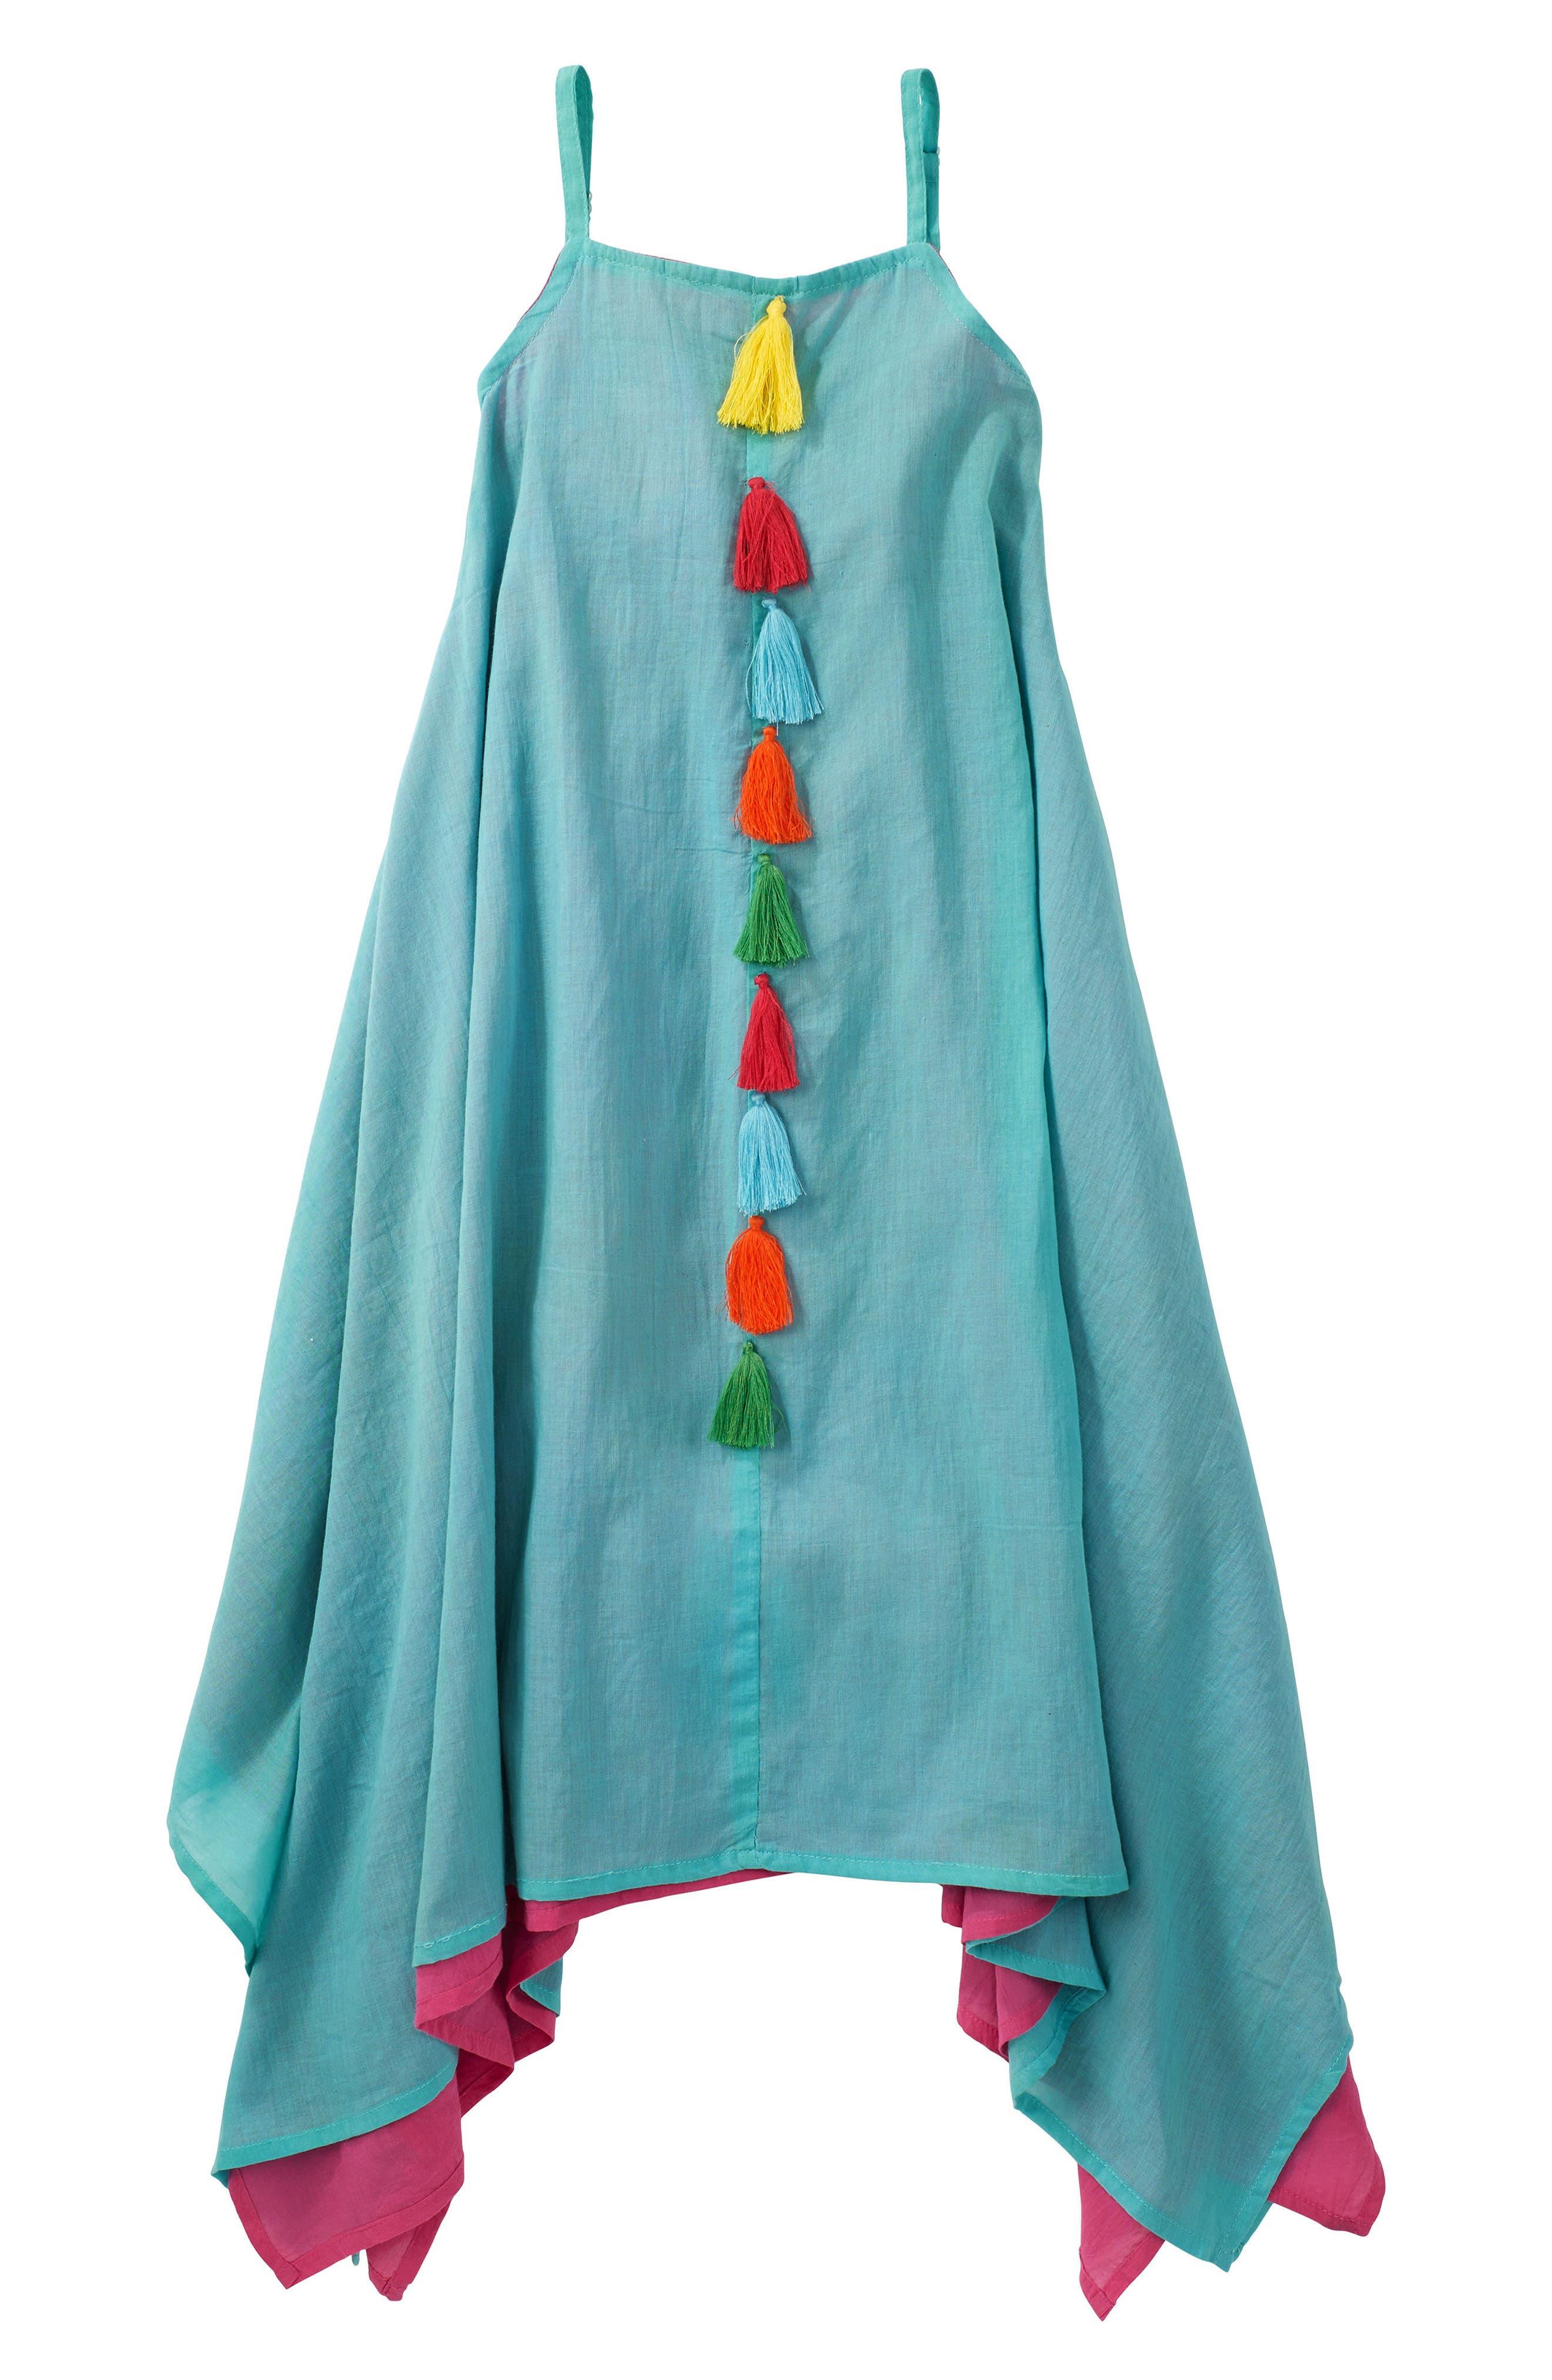 Main Image - Masalababy Citra Tassel Dress (Toddler Girls)